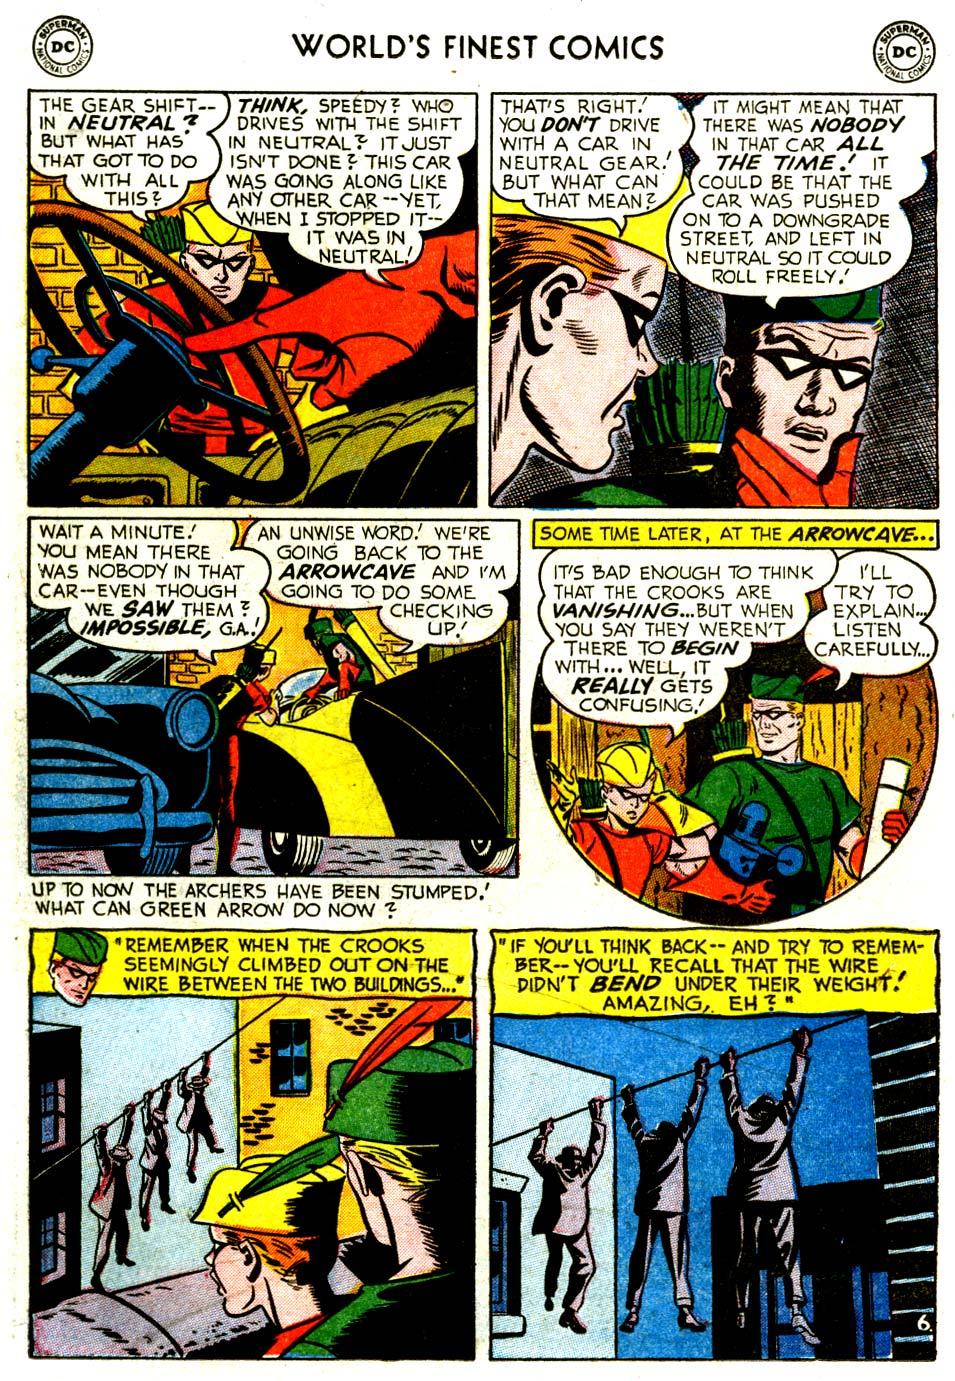 Read online World's Finest Comics comic -  Issue #68 - 32